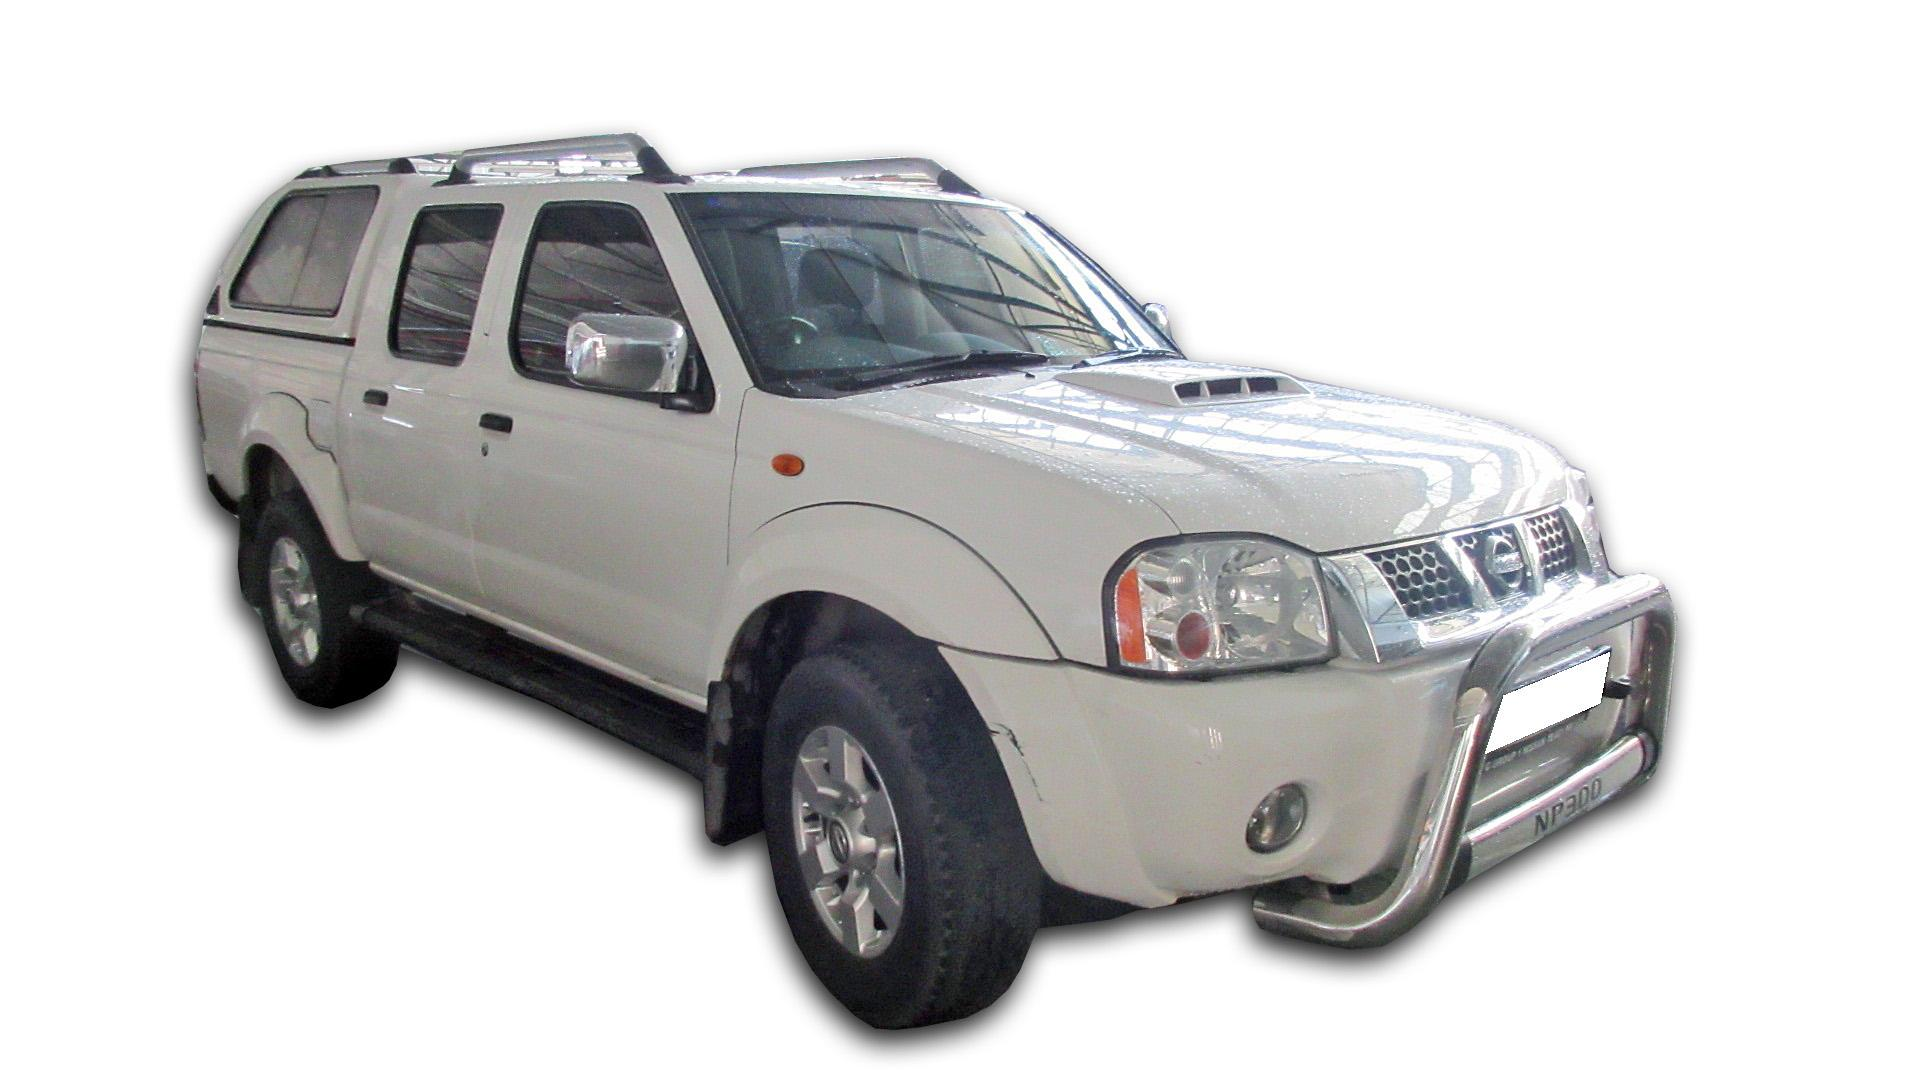 Nissan Hardbody NP300 2.5 TDI